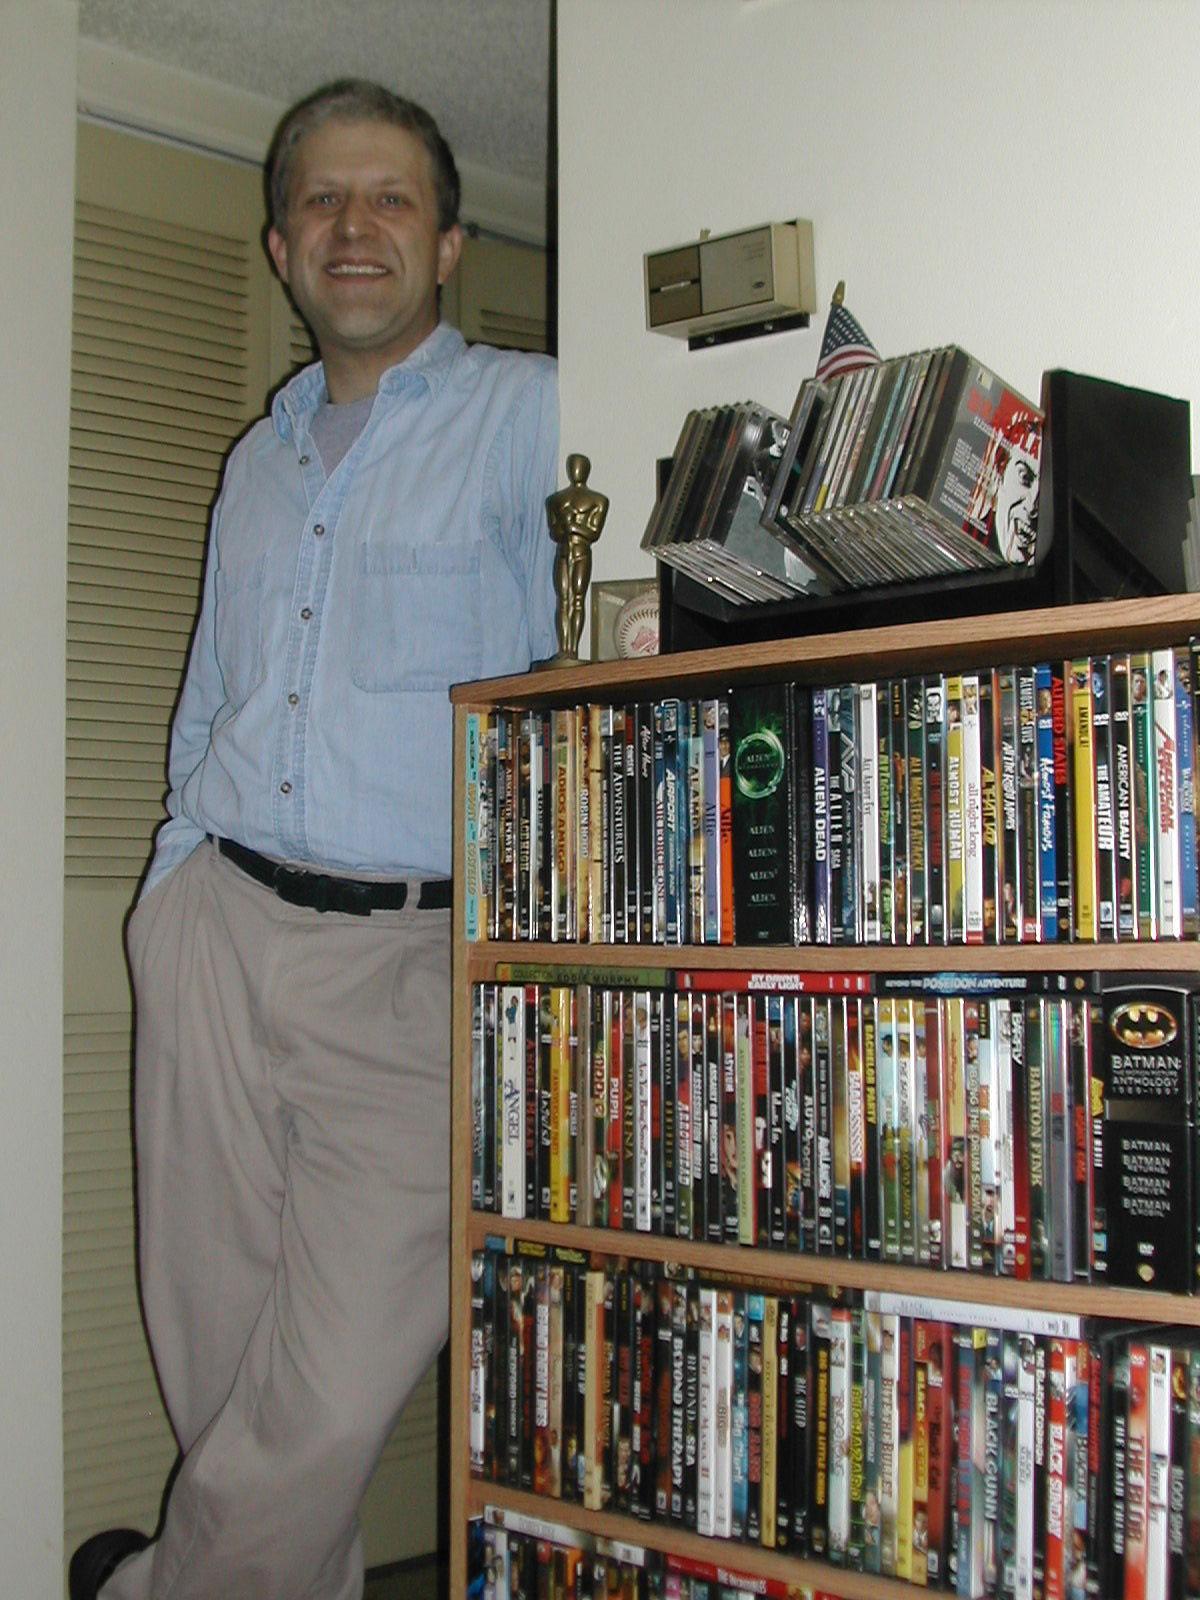 Lights Come On Show Ends For Newspaper Film Critics Latest News Greensboro Com